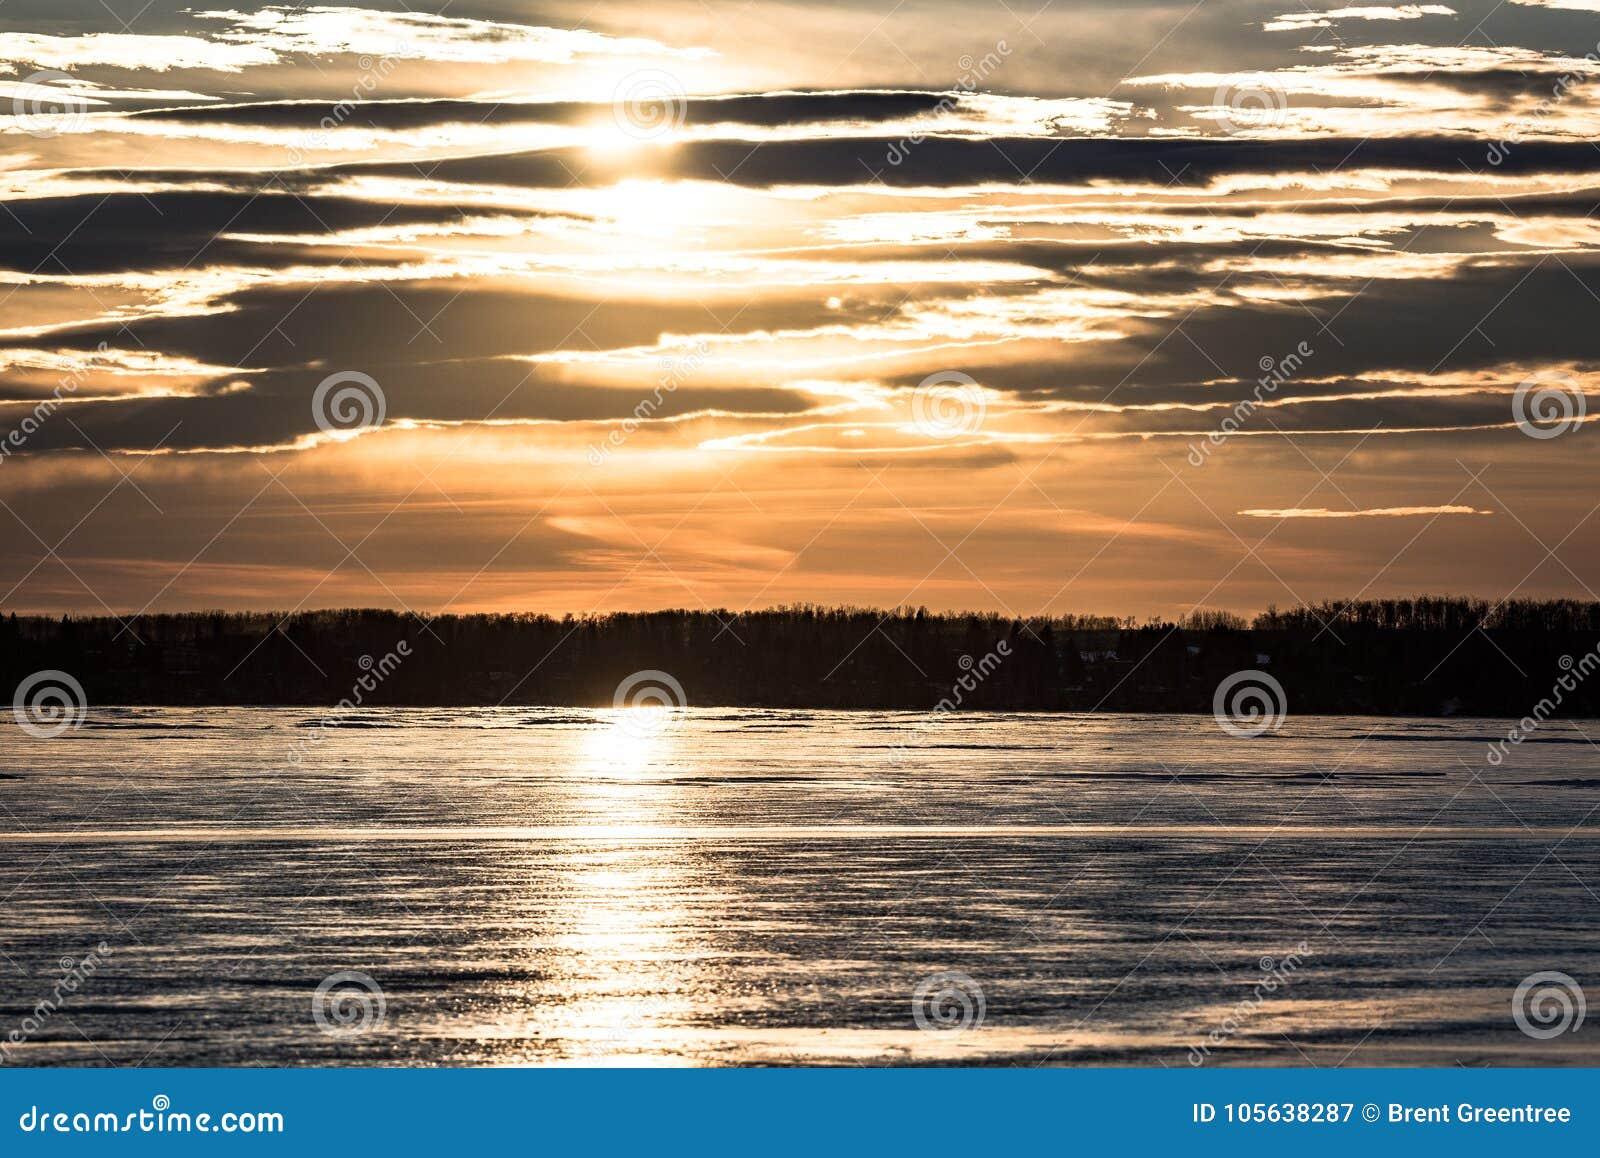 Sylvan Lake Sunset Over The-Ijs